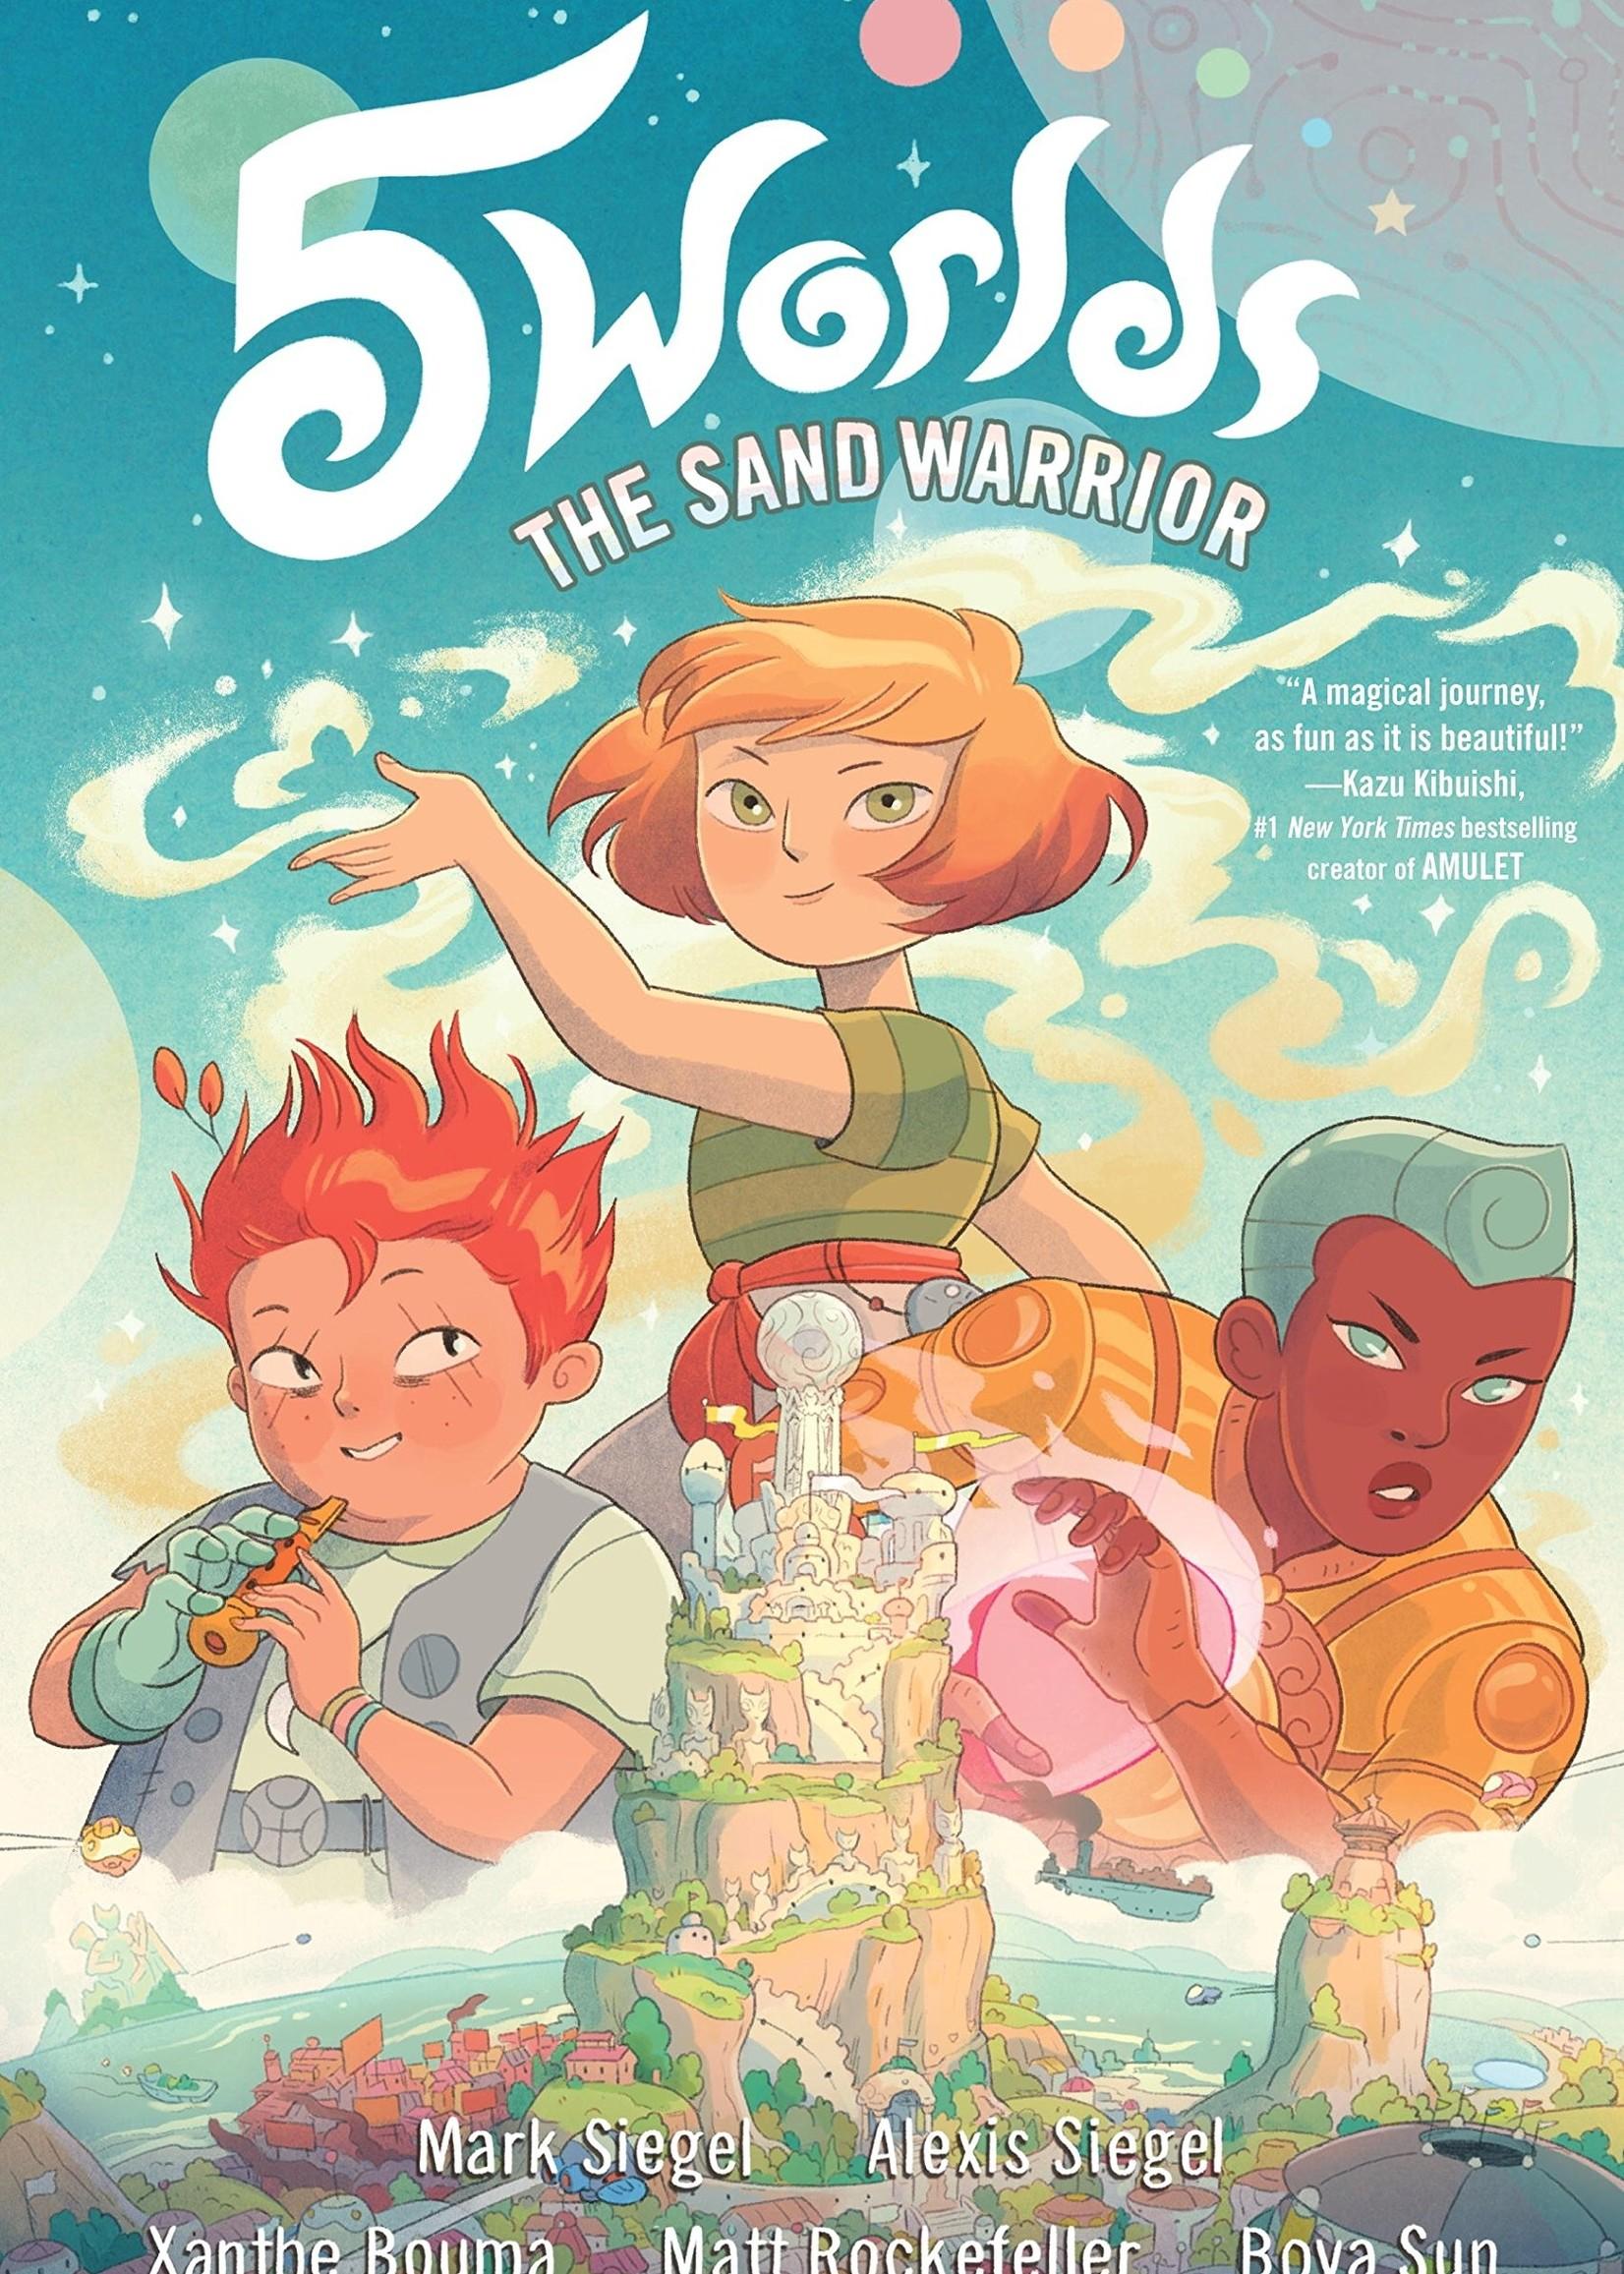 5 Worlds #01: The Sand Warrior Graphic Novel - Paperback